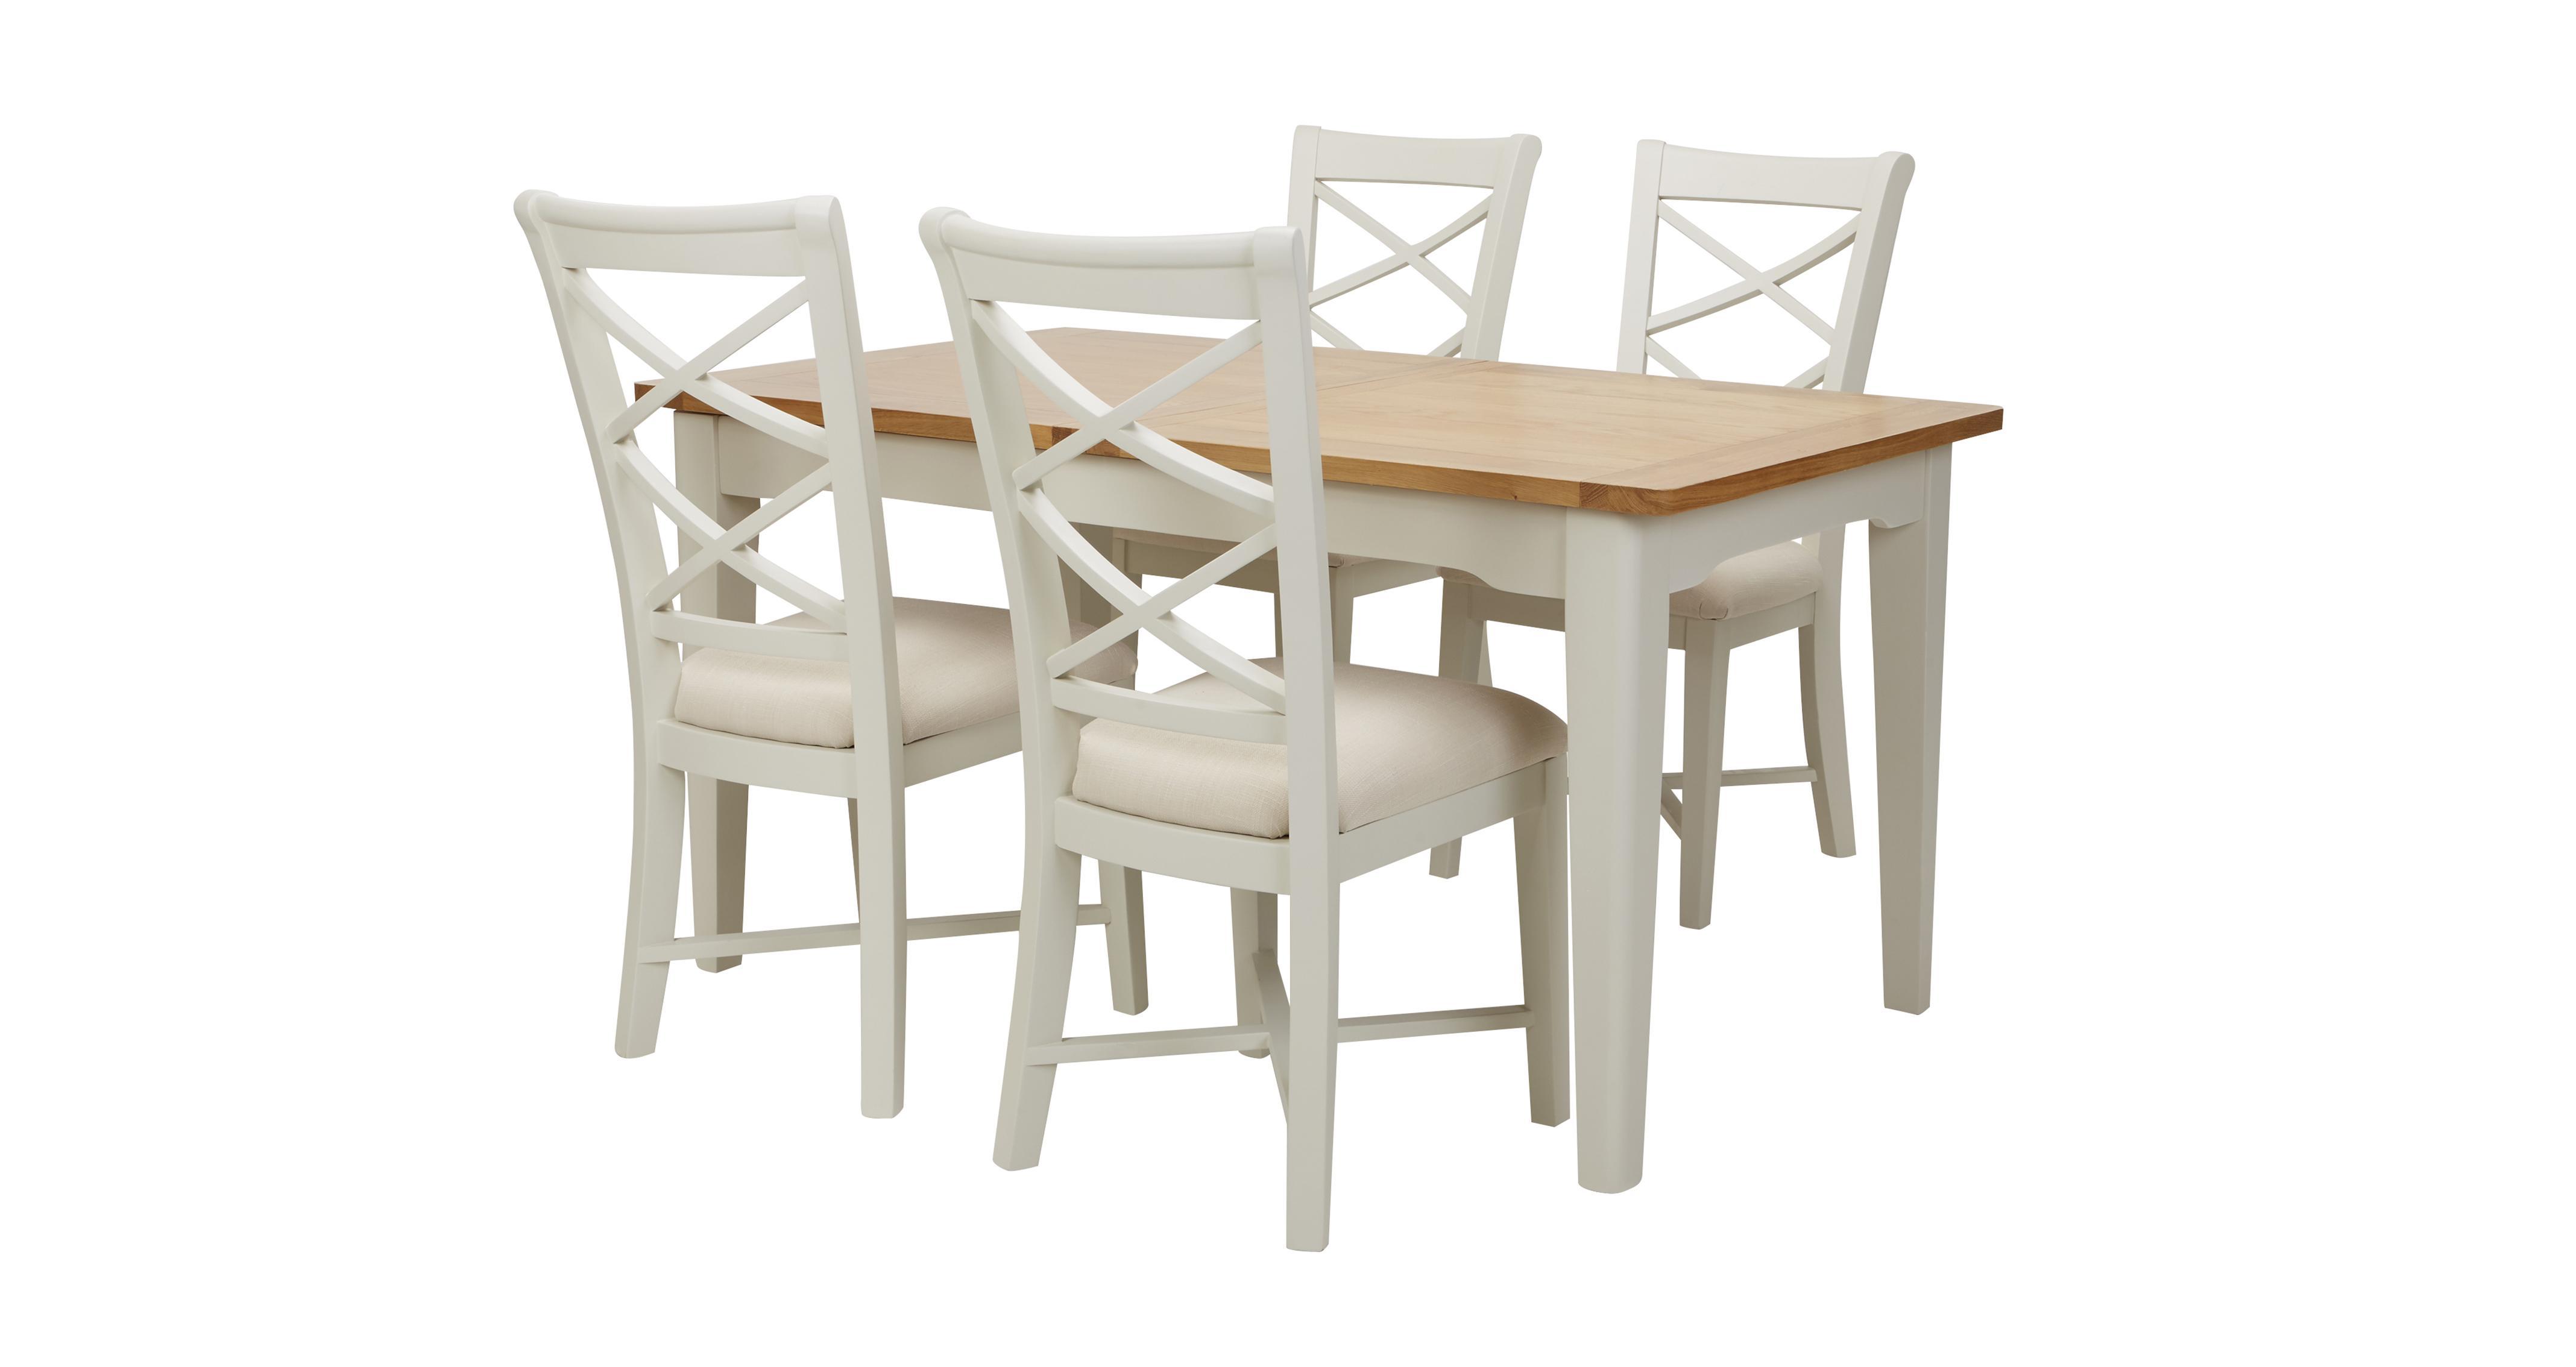 Kleine Eettafel Set.Kleine Eettafel Met Stoelen Perfect Design Eettafel Design Eettafel